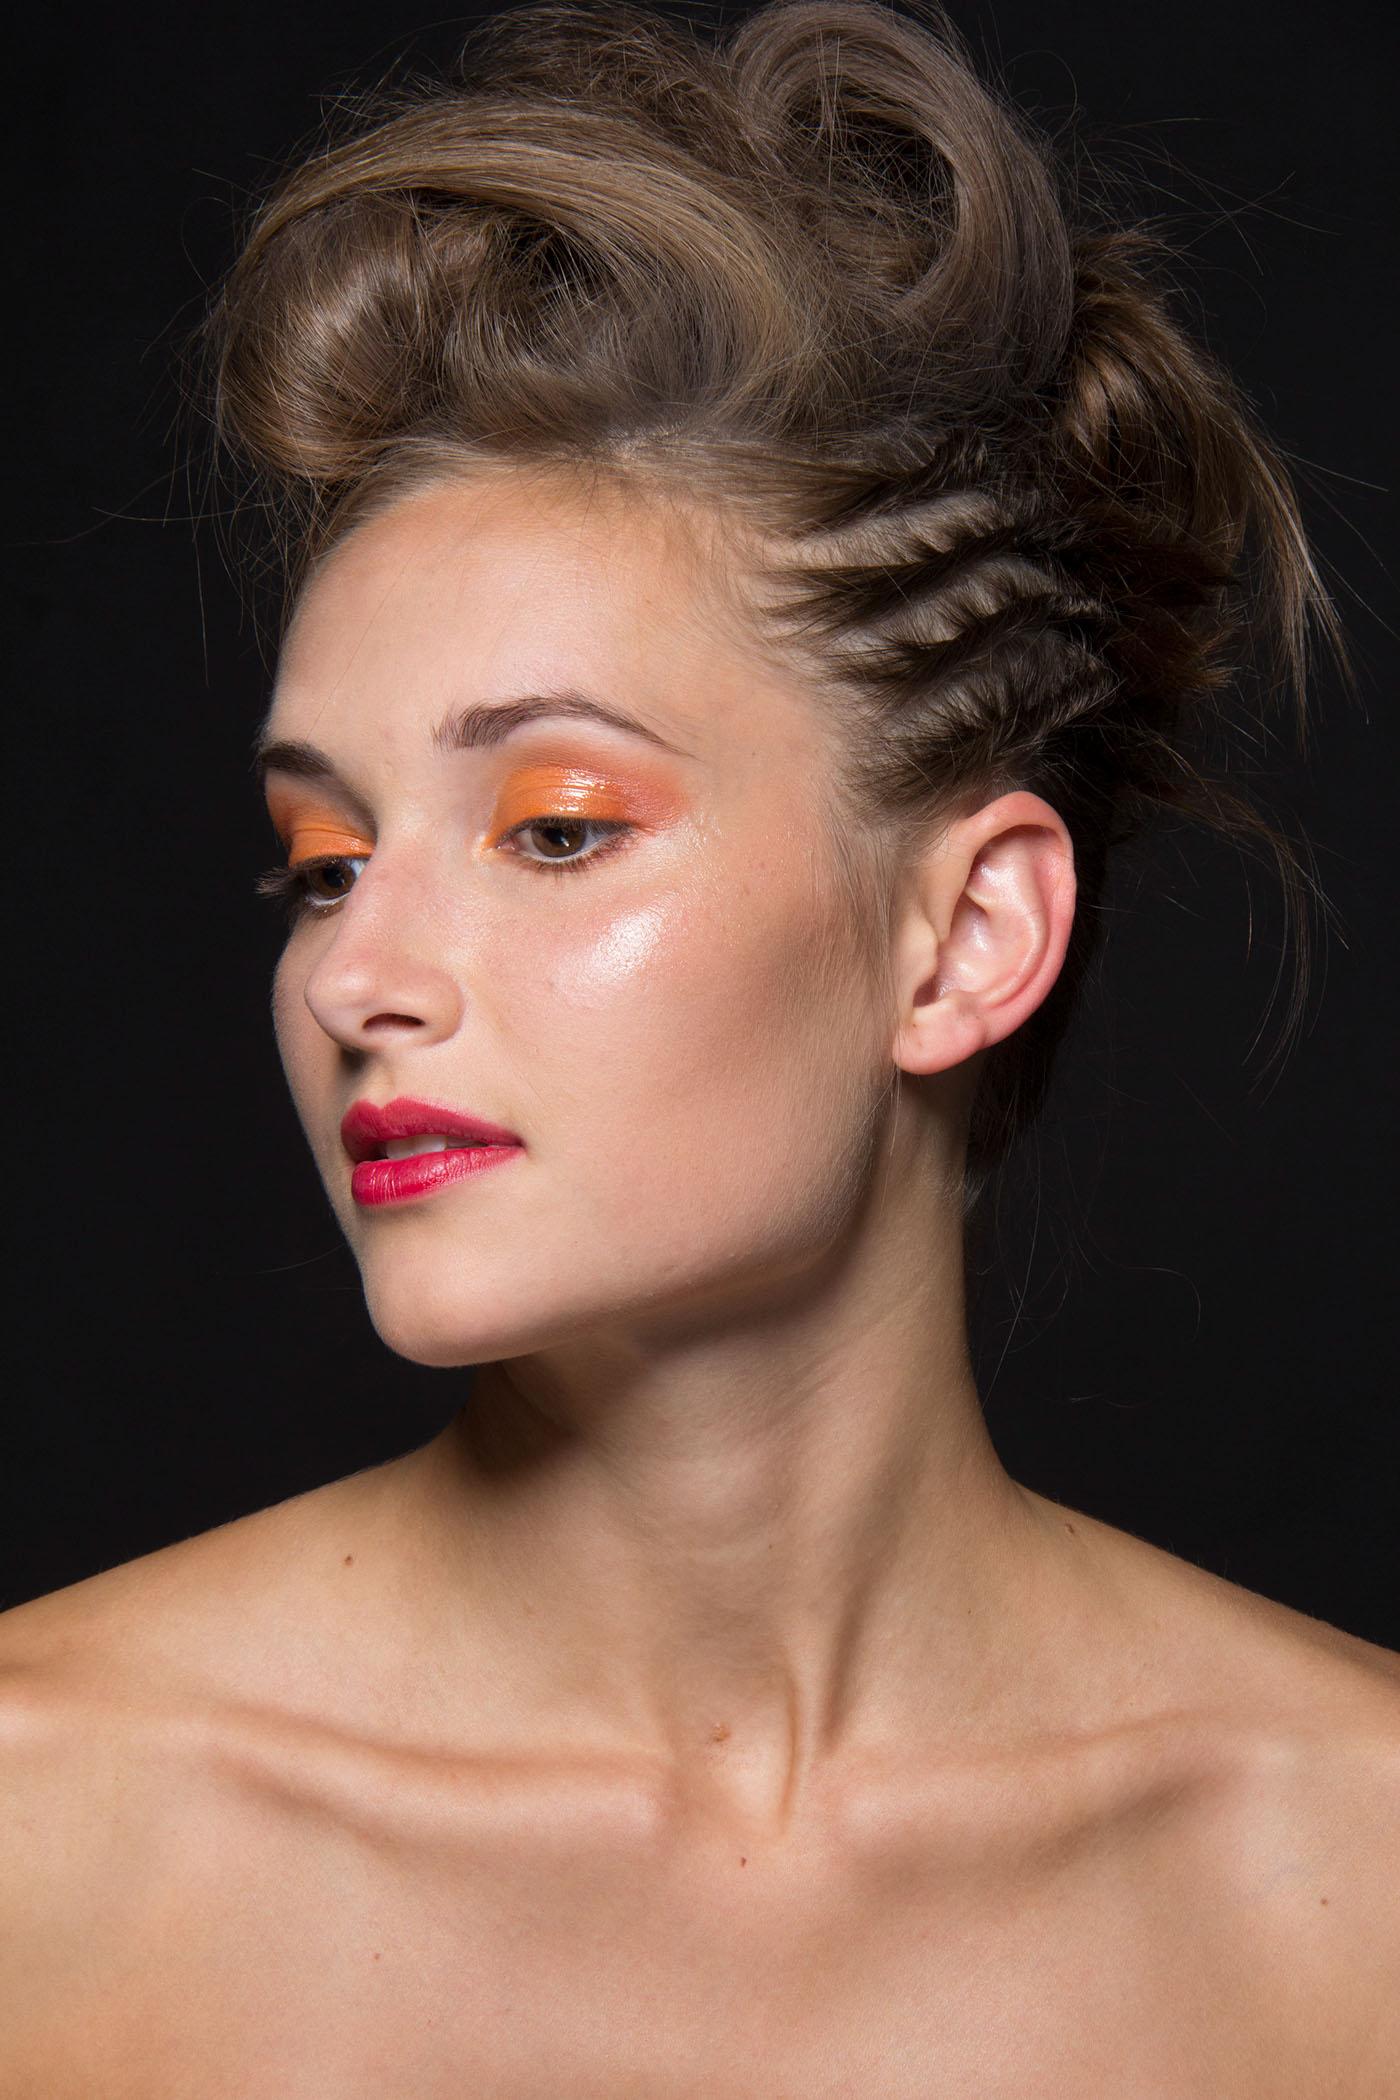 Creative Beauty Photography by Alex Malikov | Daily design